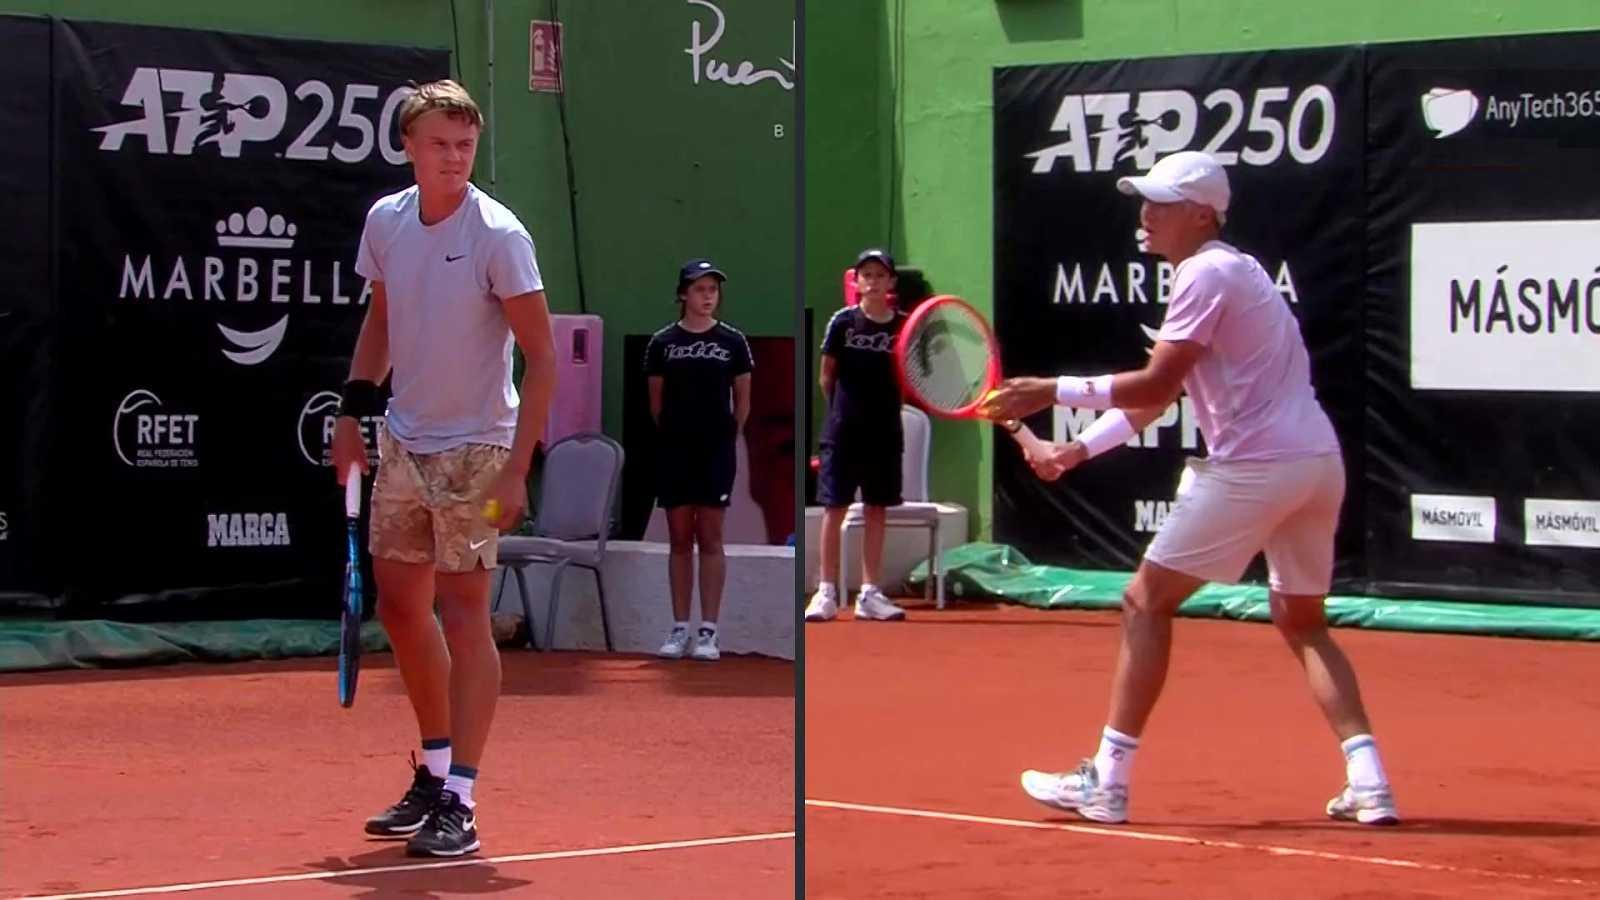 Tenis - ATP 250 Torneo Marbella: H. Rune - S. Kwon - ver ahora